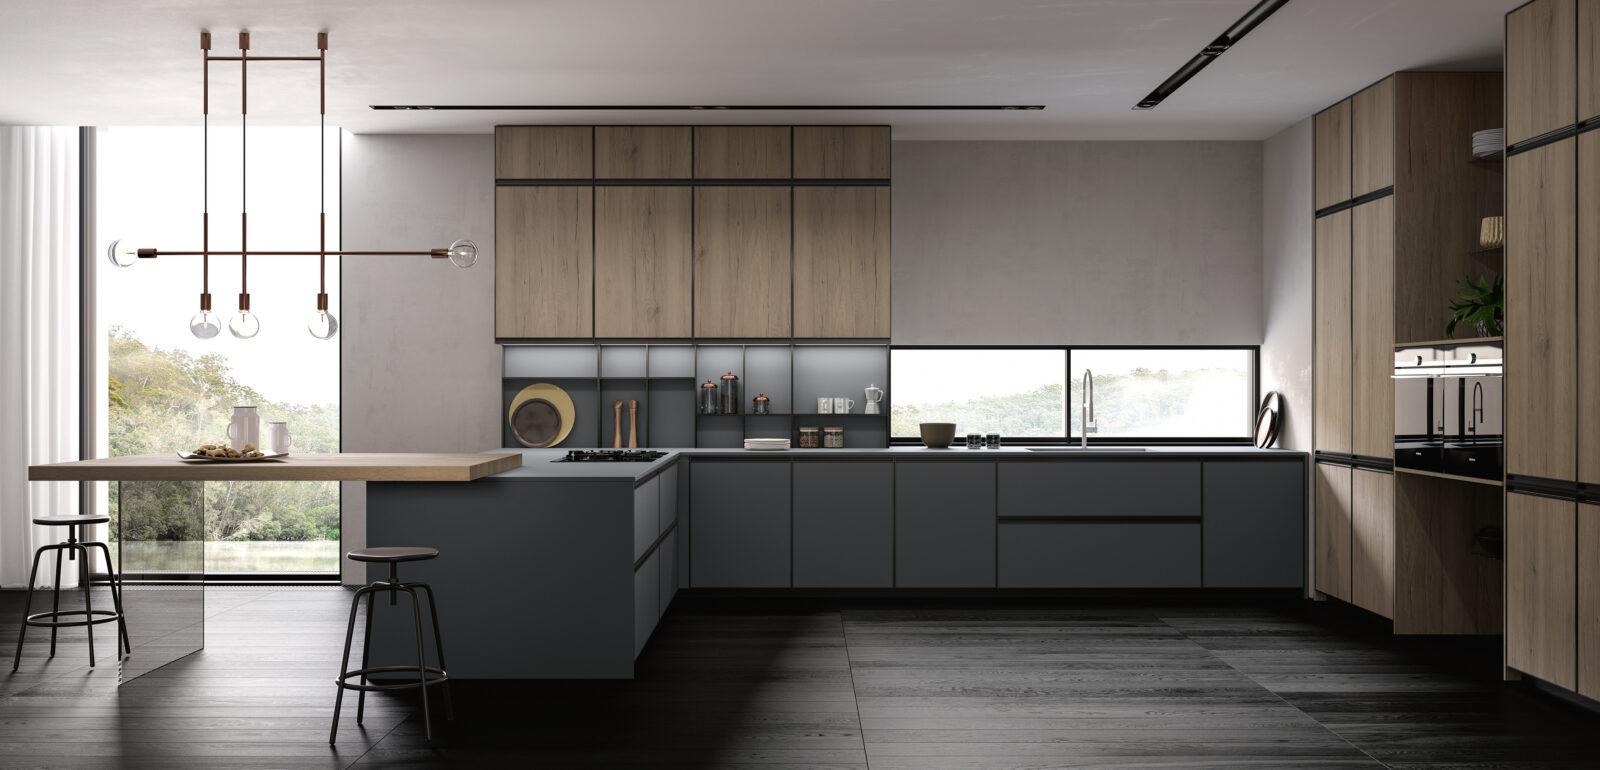 cucina moderna con isola Arredo3 Kronos foto 02